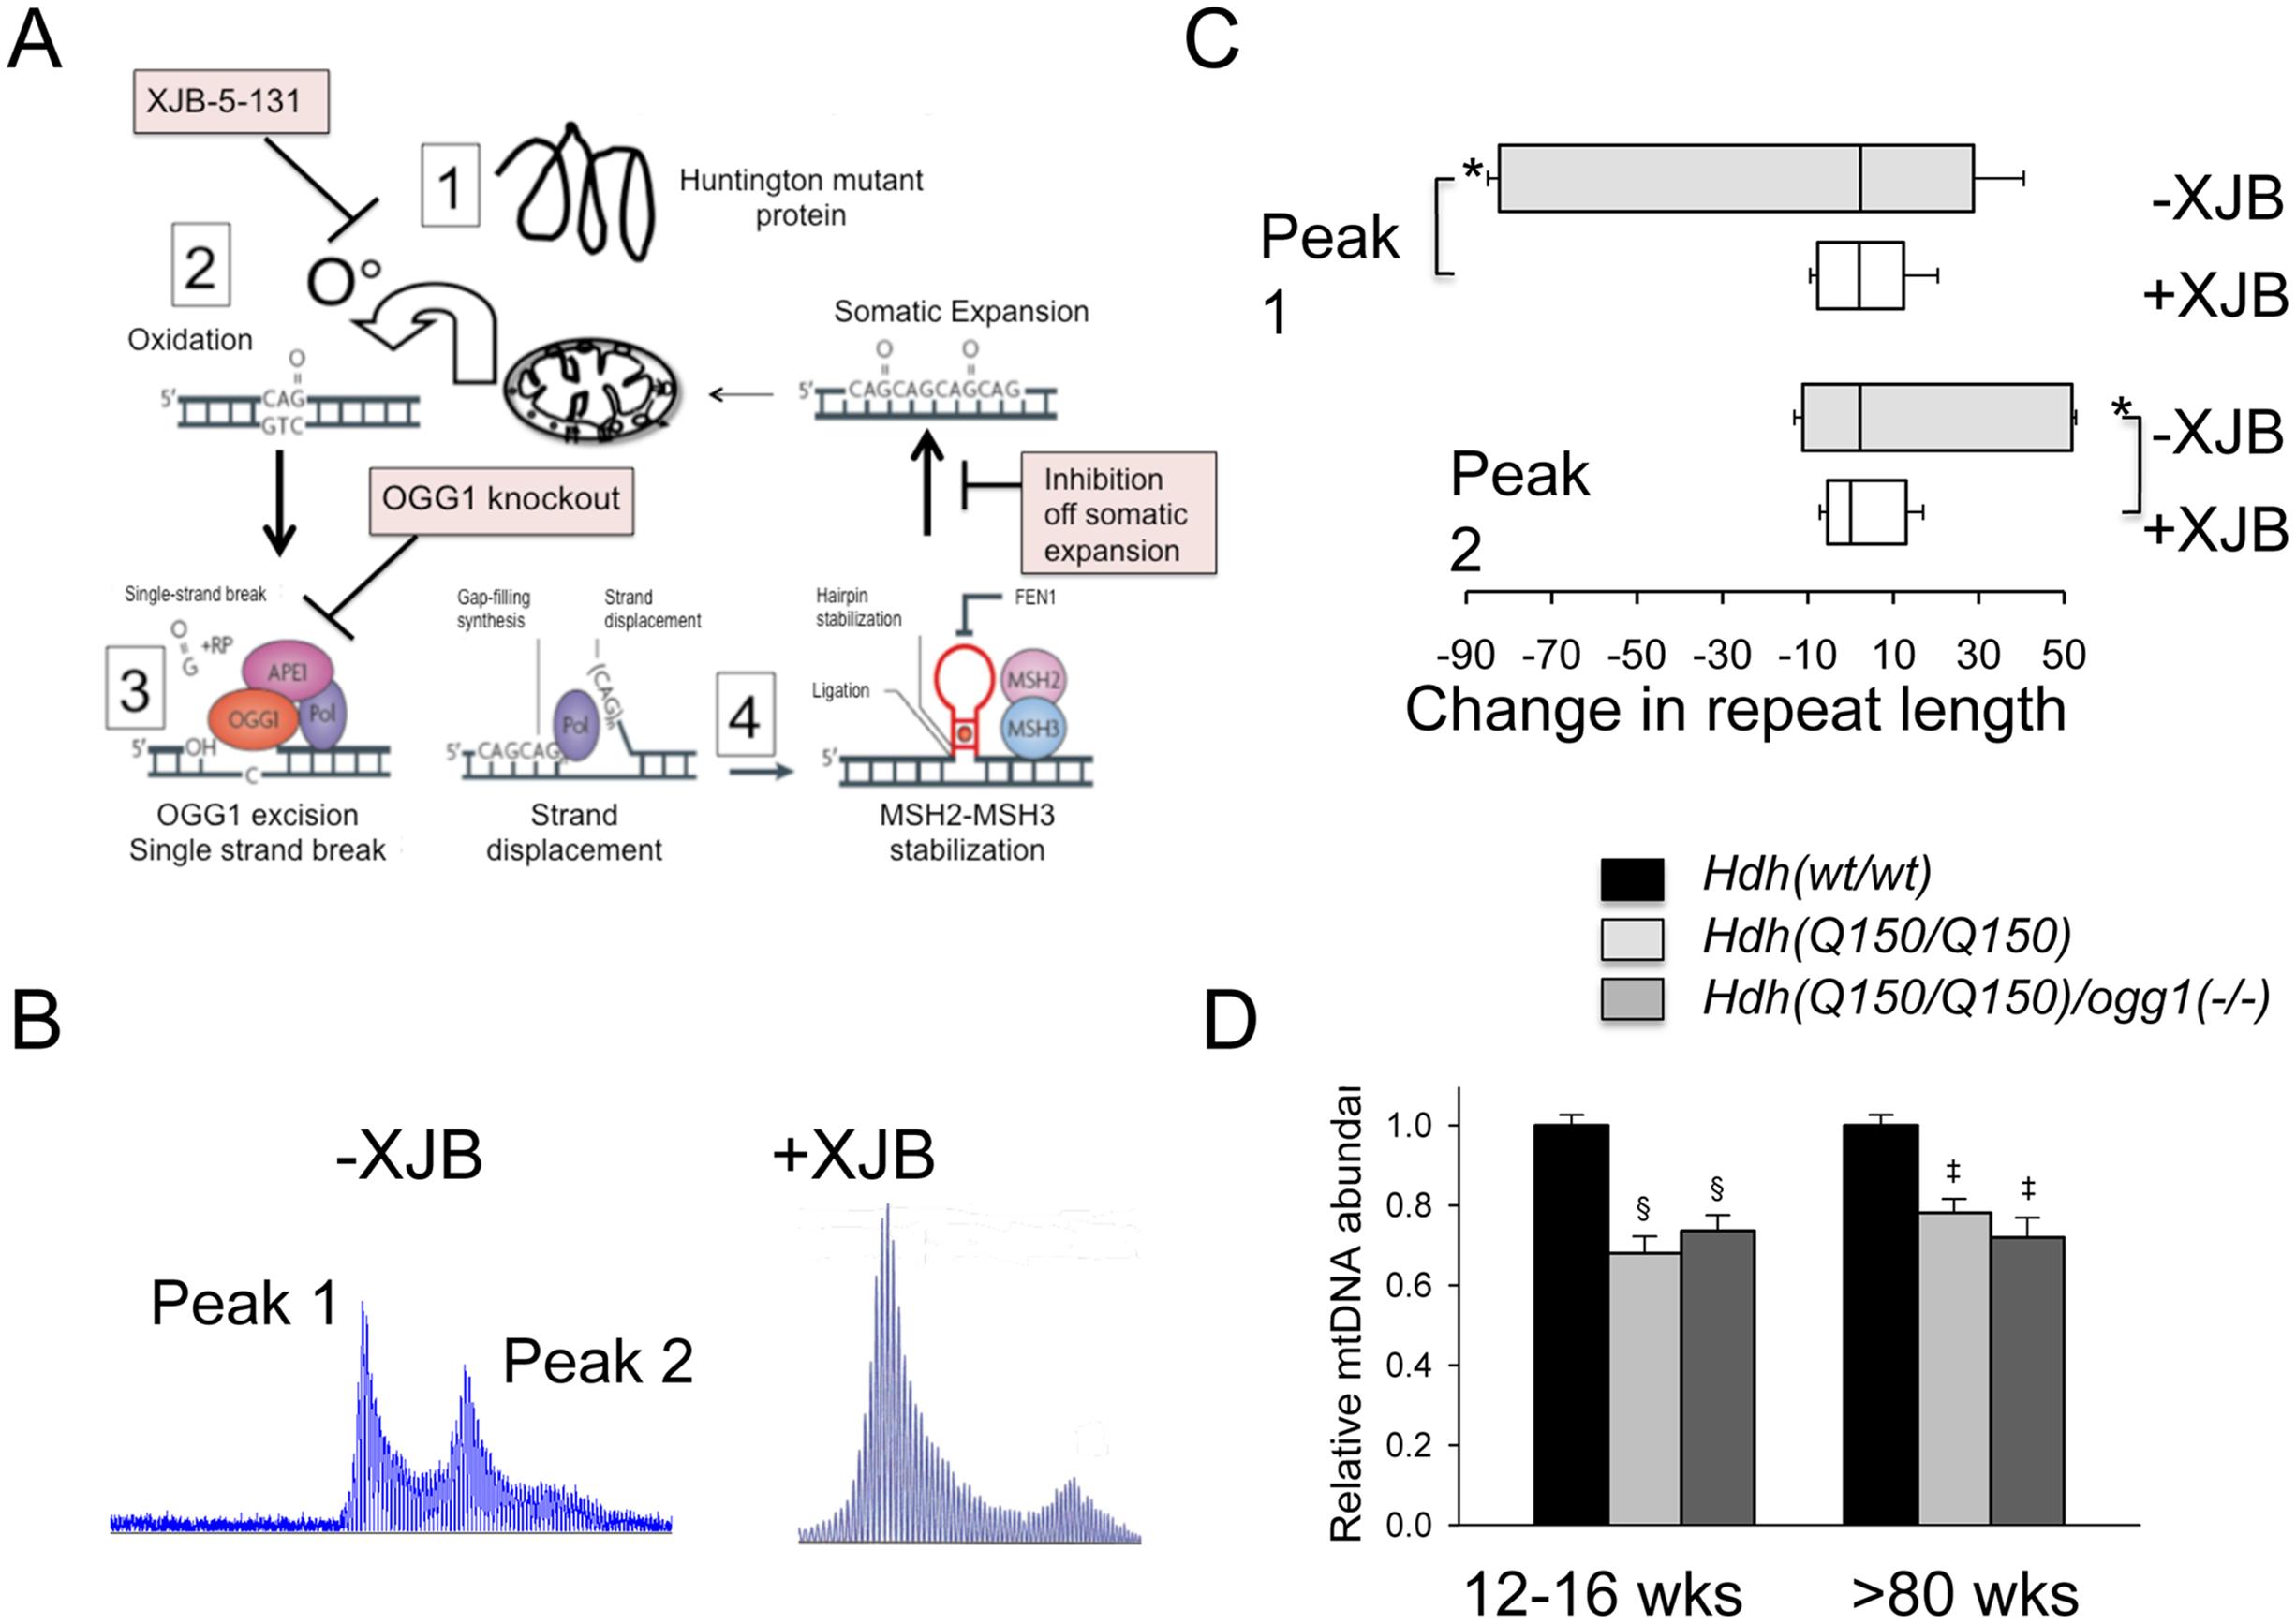 Pharmacological intervention suppresses oxidative DNA damage and somatic mutation <i>in vivo</i>.